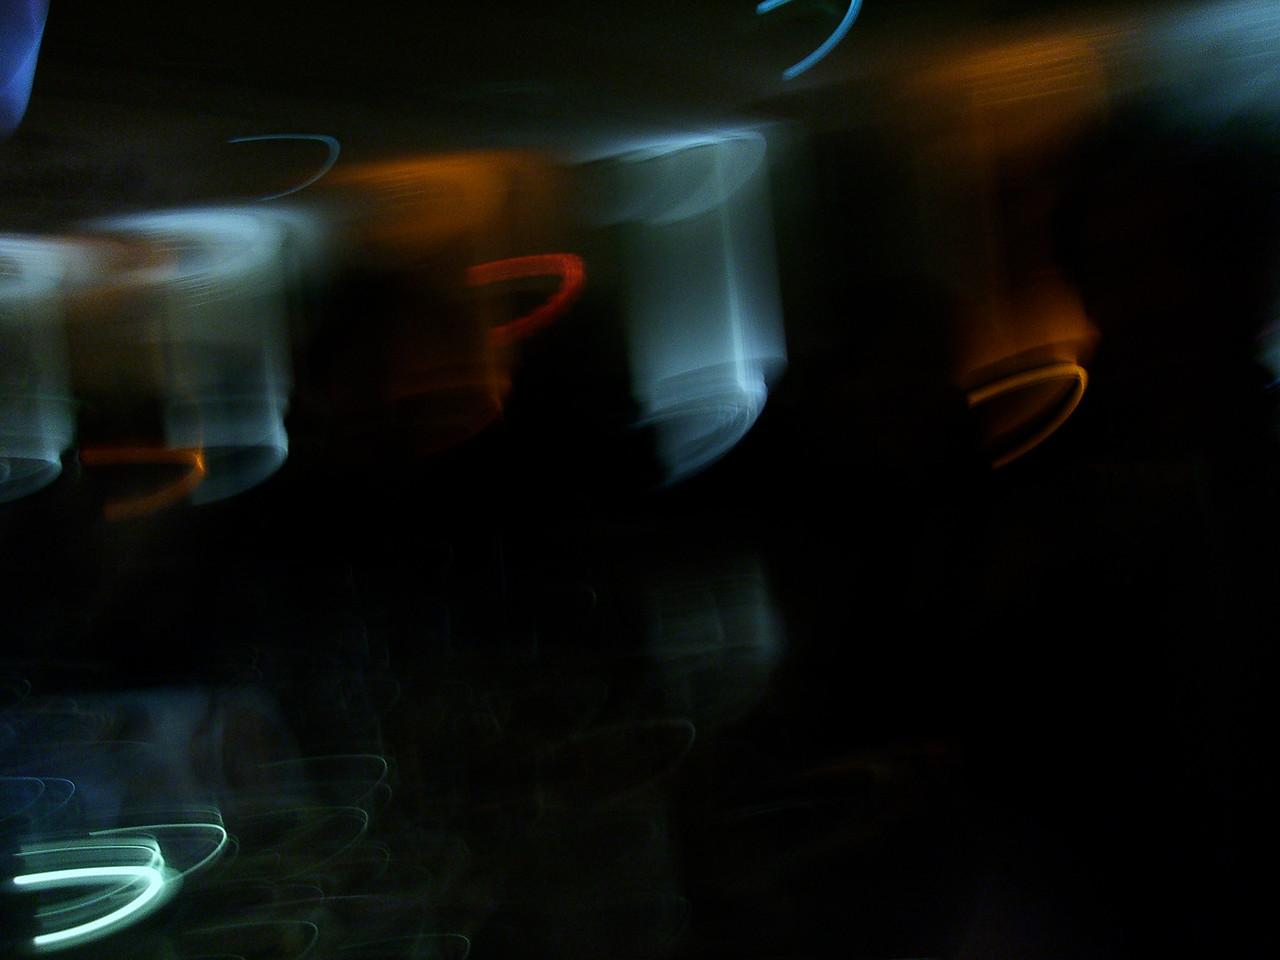 Reception - Mike & Natalie Liu - blur